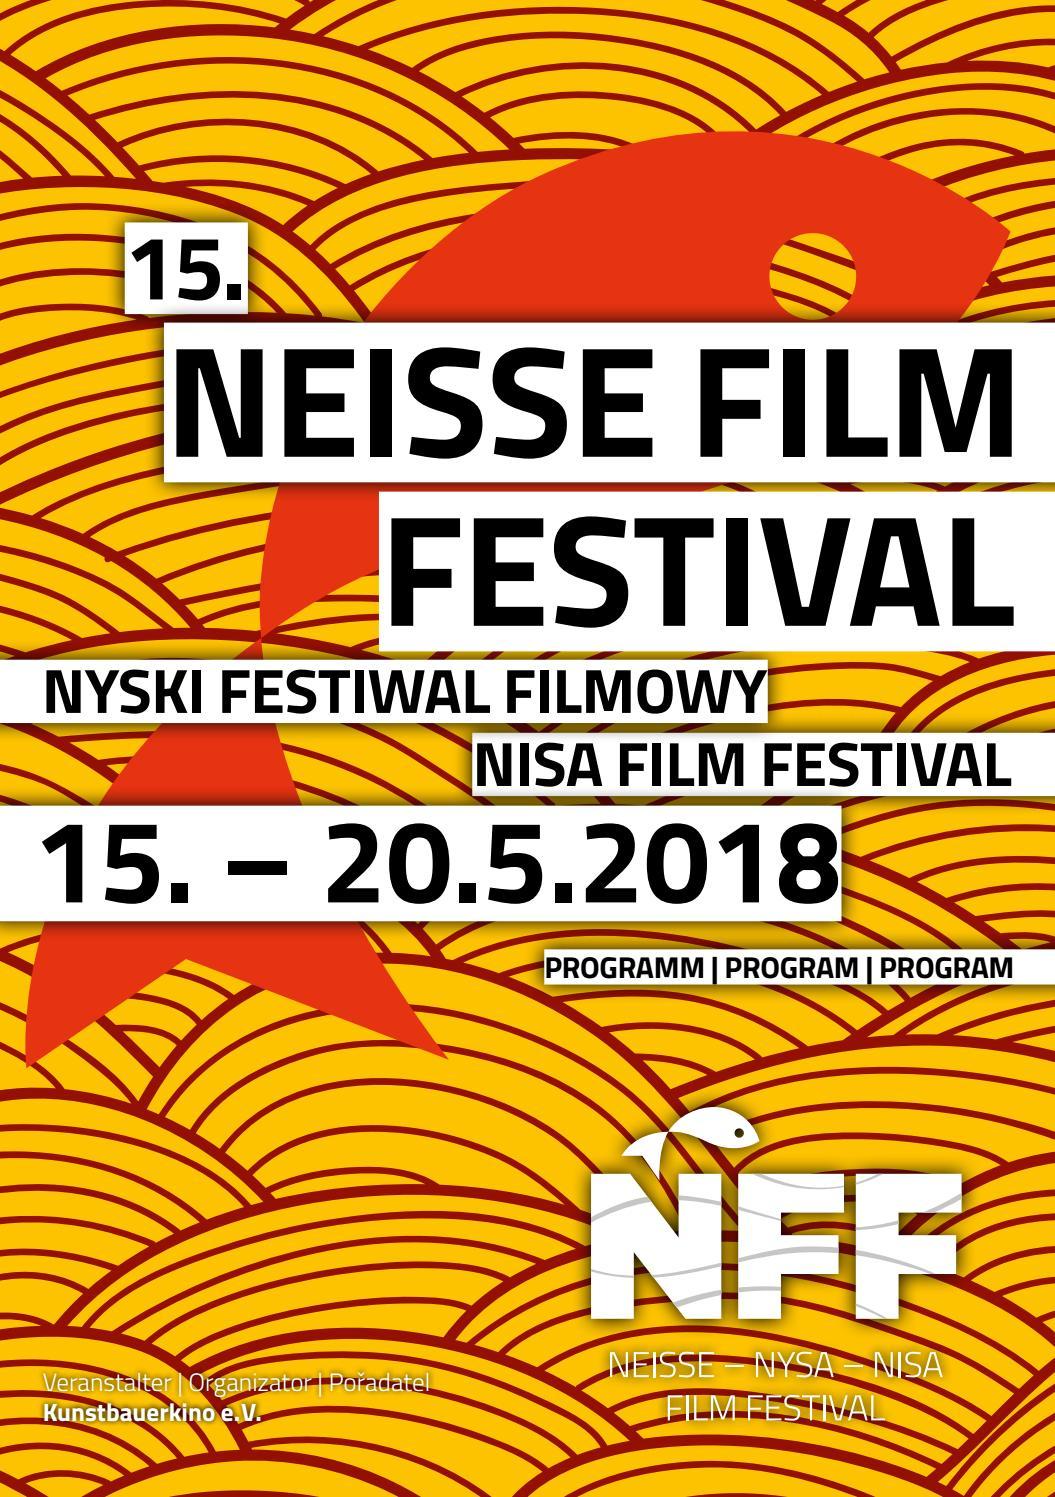 Neisse Film Festival 2018 by Neisse Film Festival - issuu d7a14cf633